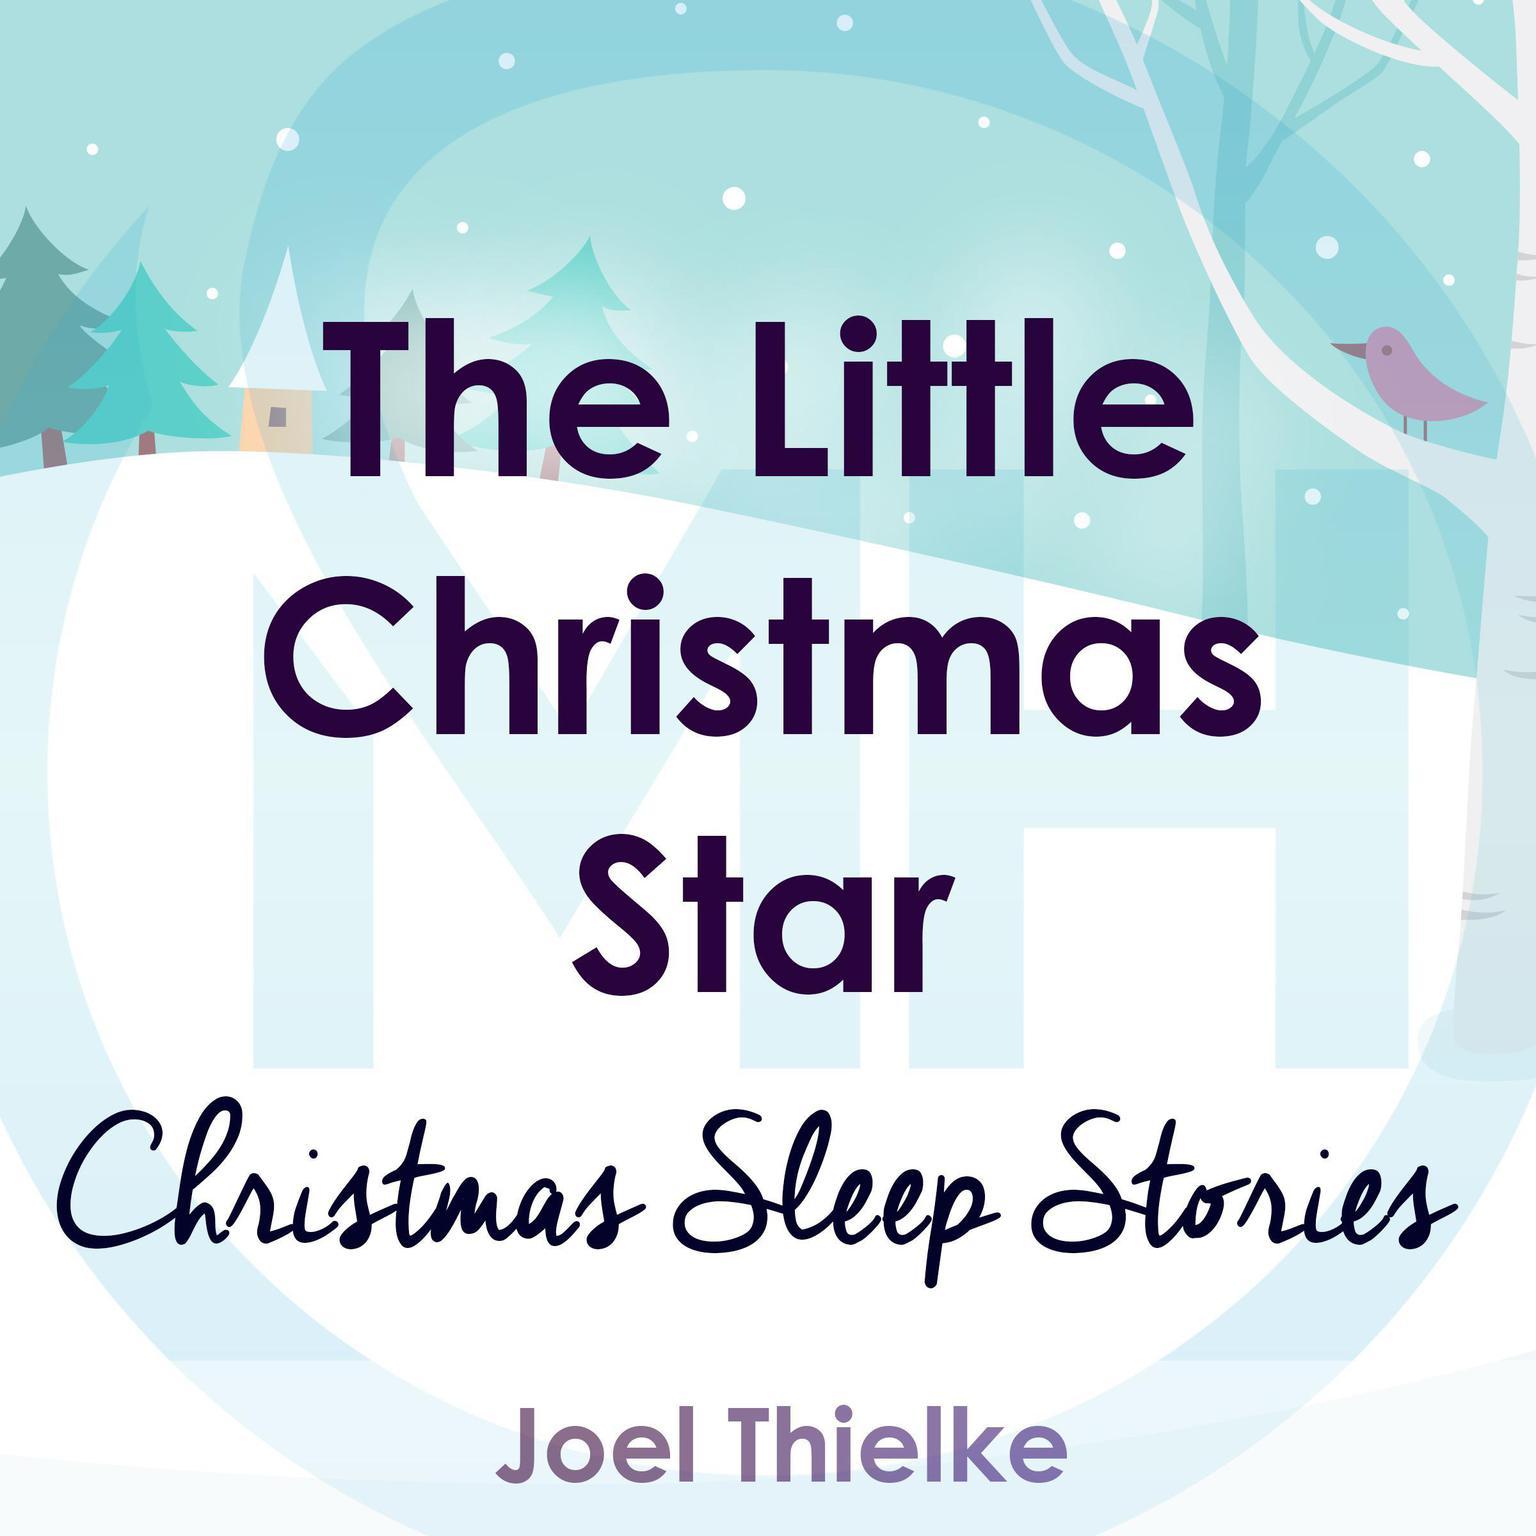 The Little Christmas Star - Christmas Sleep Stories Audiobook, by Joel Thielke